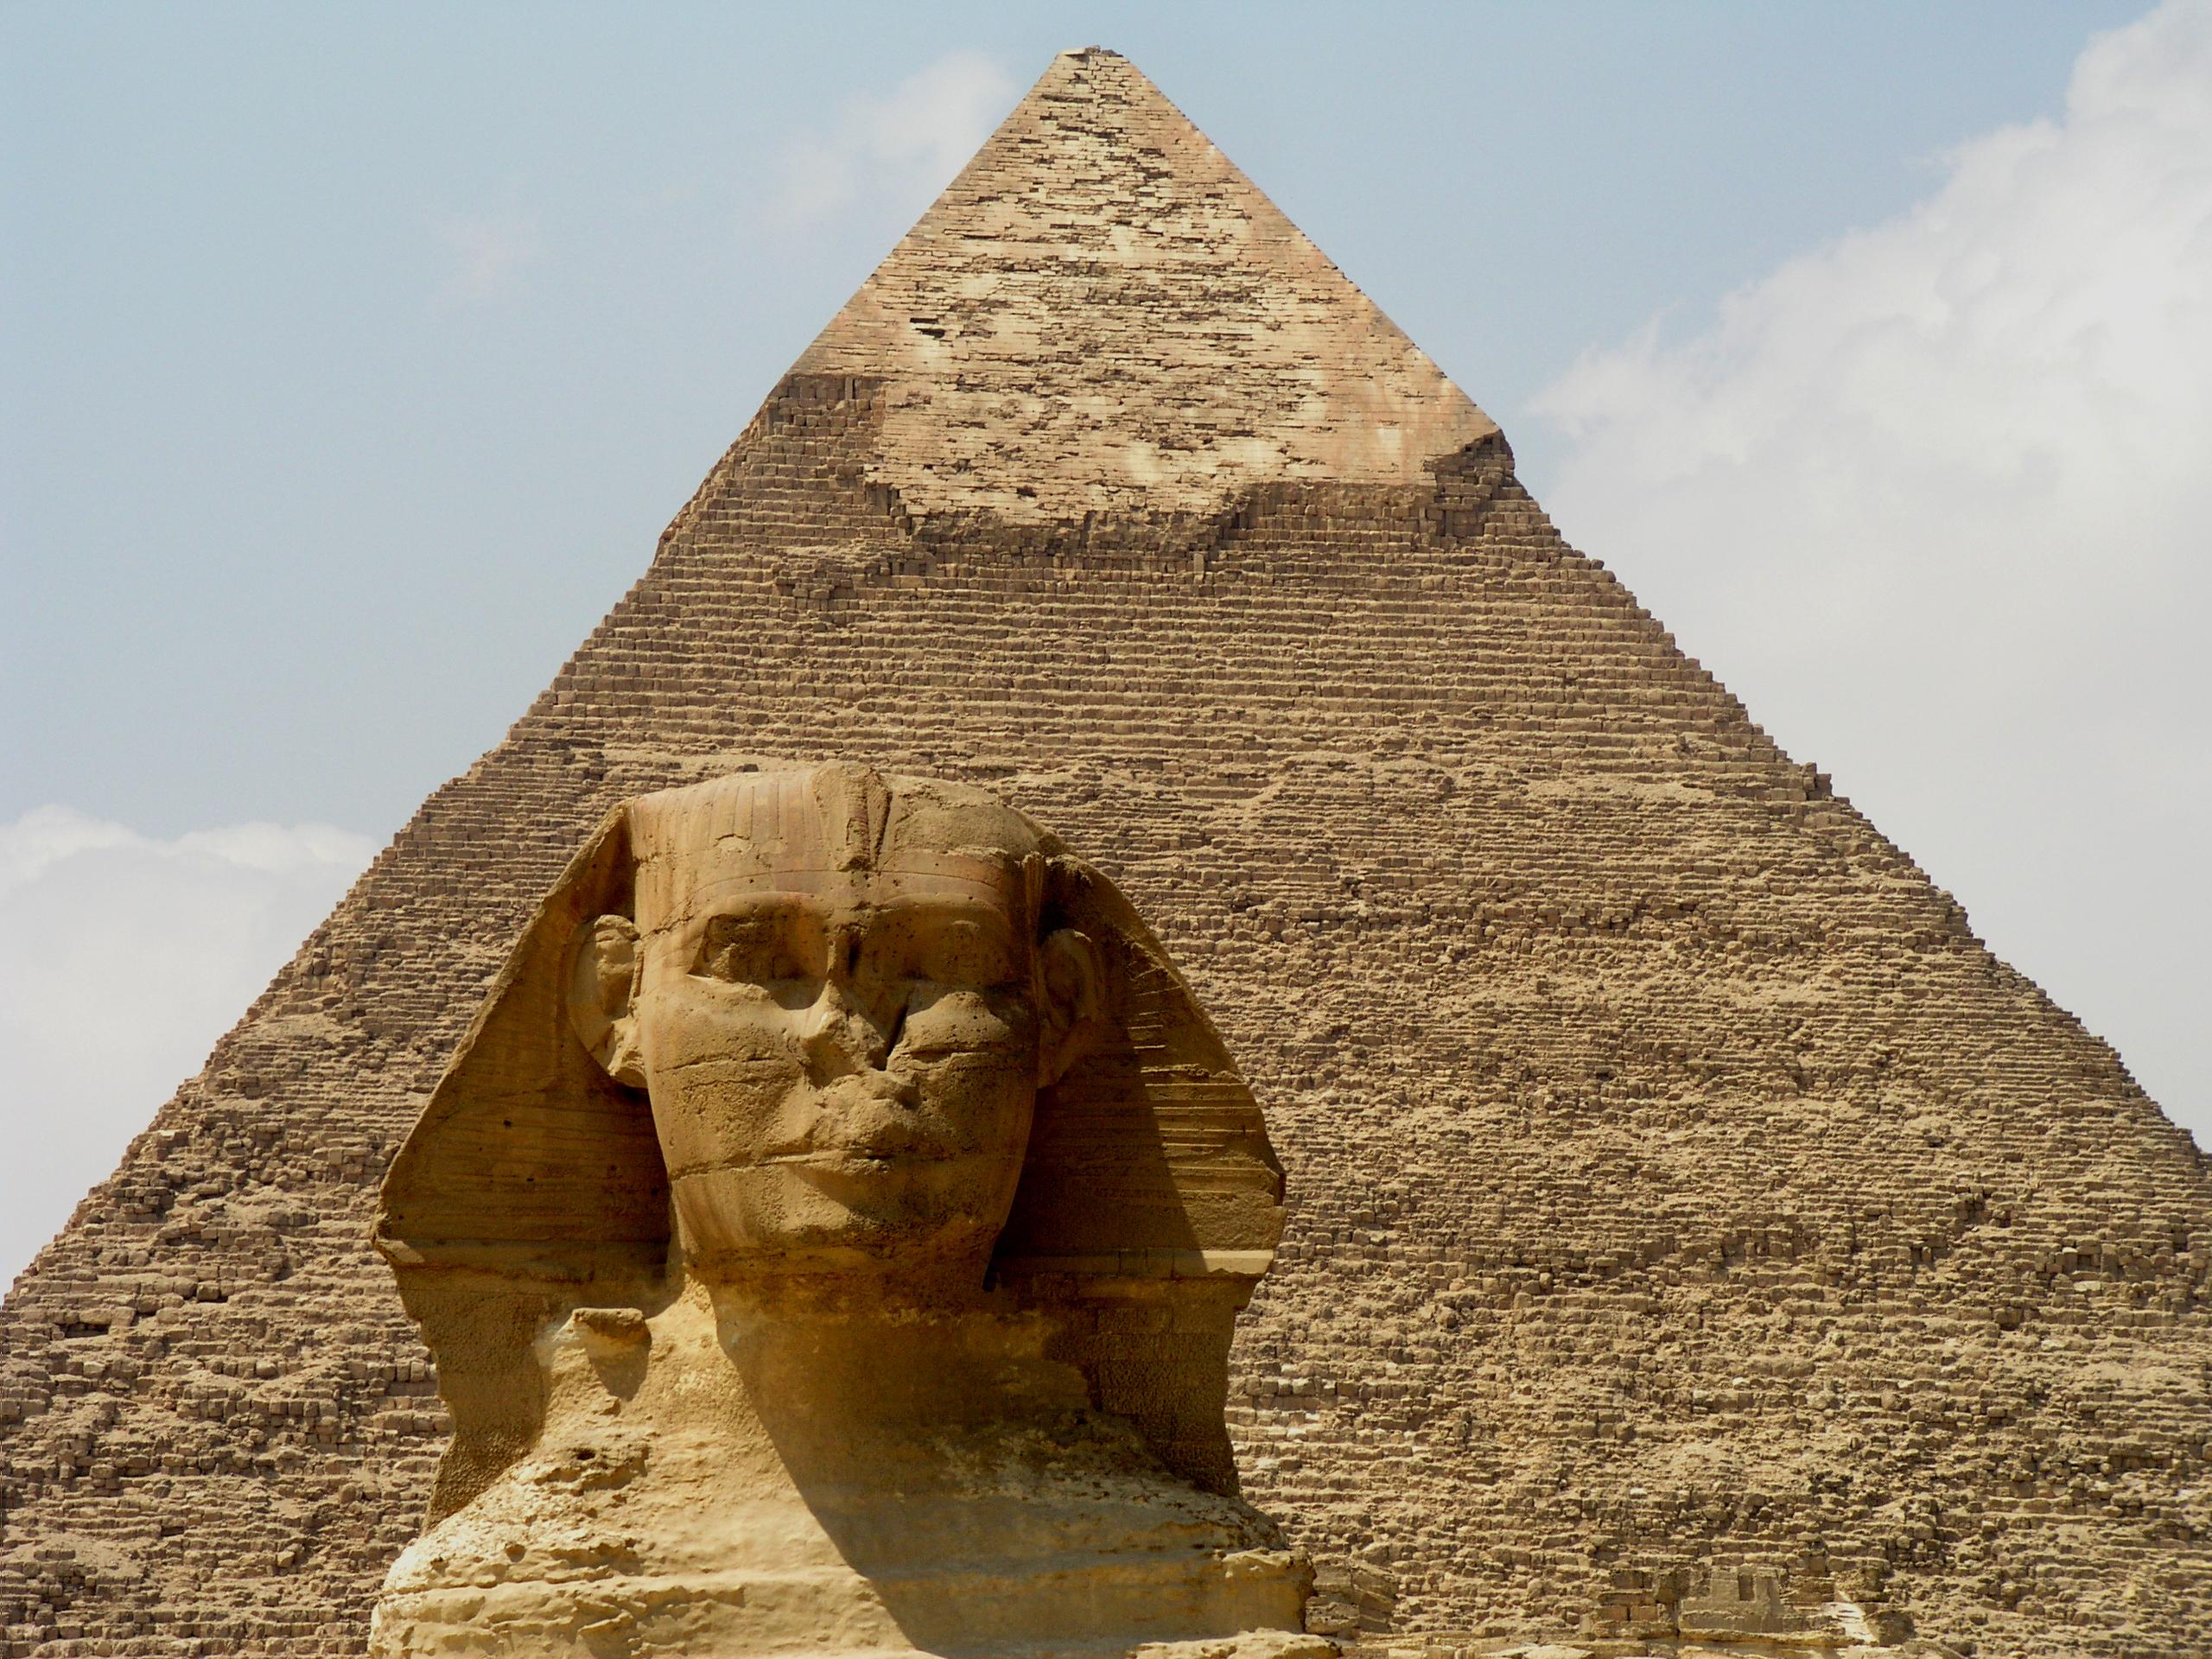 Great Sphinx, Chephren Pyramid, Giza, Egypt  № 2245231 загрузить